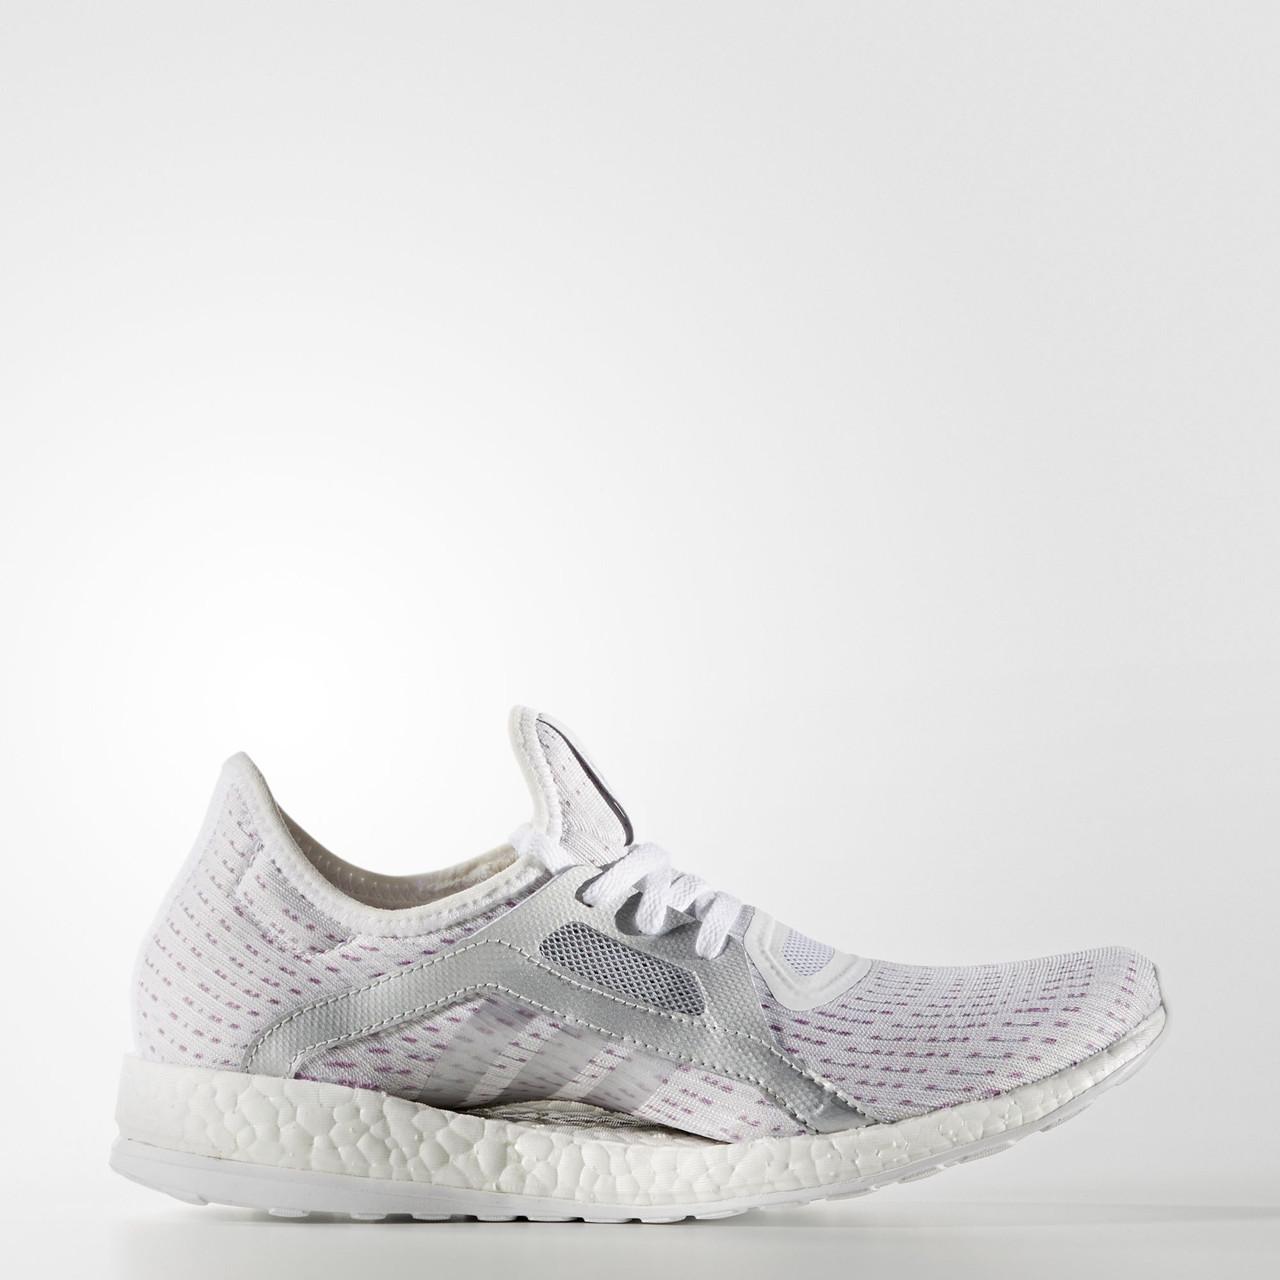 Кроссовки женские Adidas Pure Boost X W BB4016